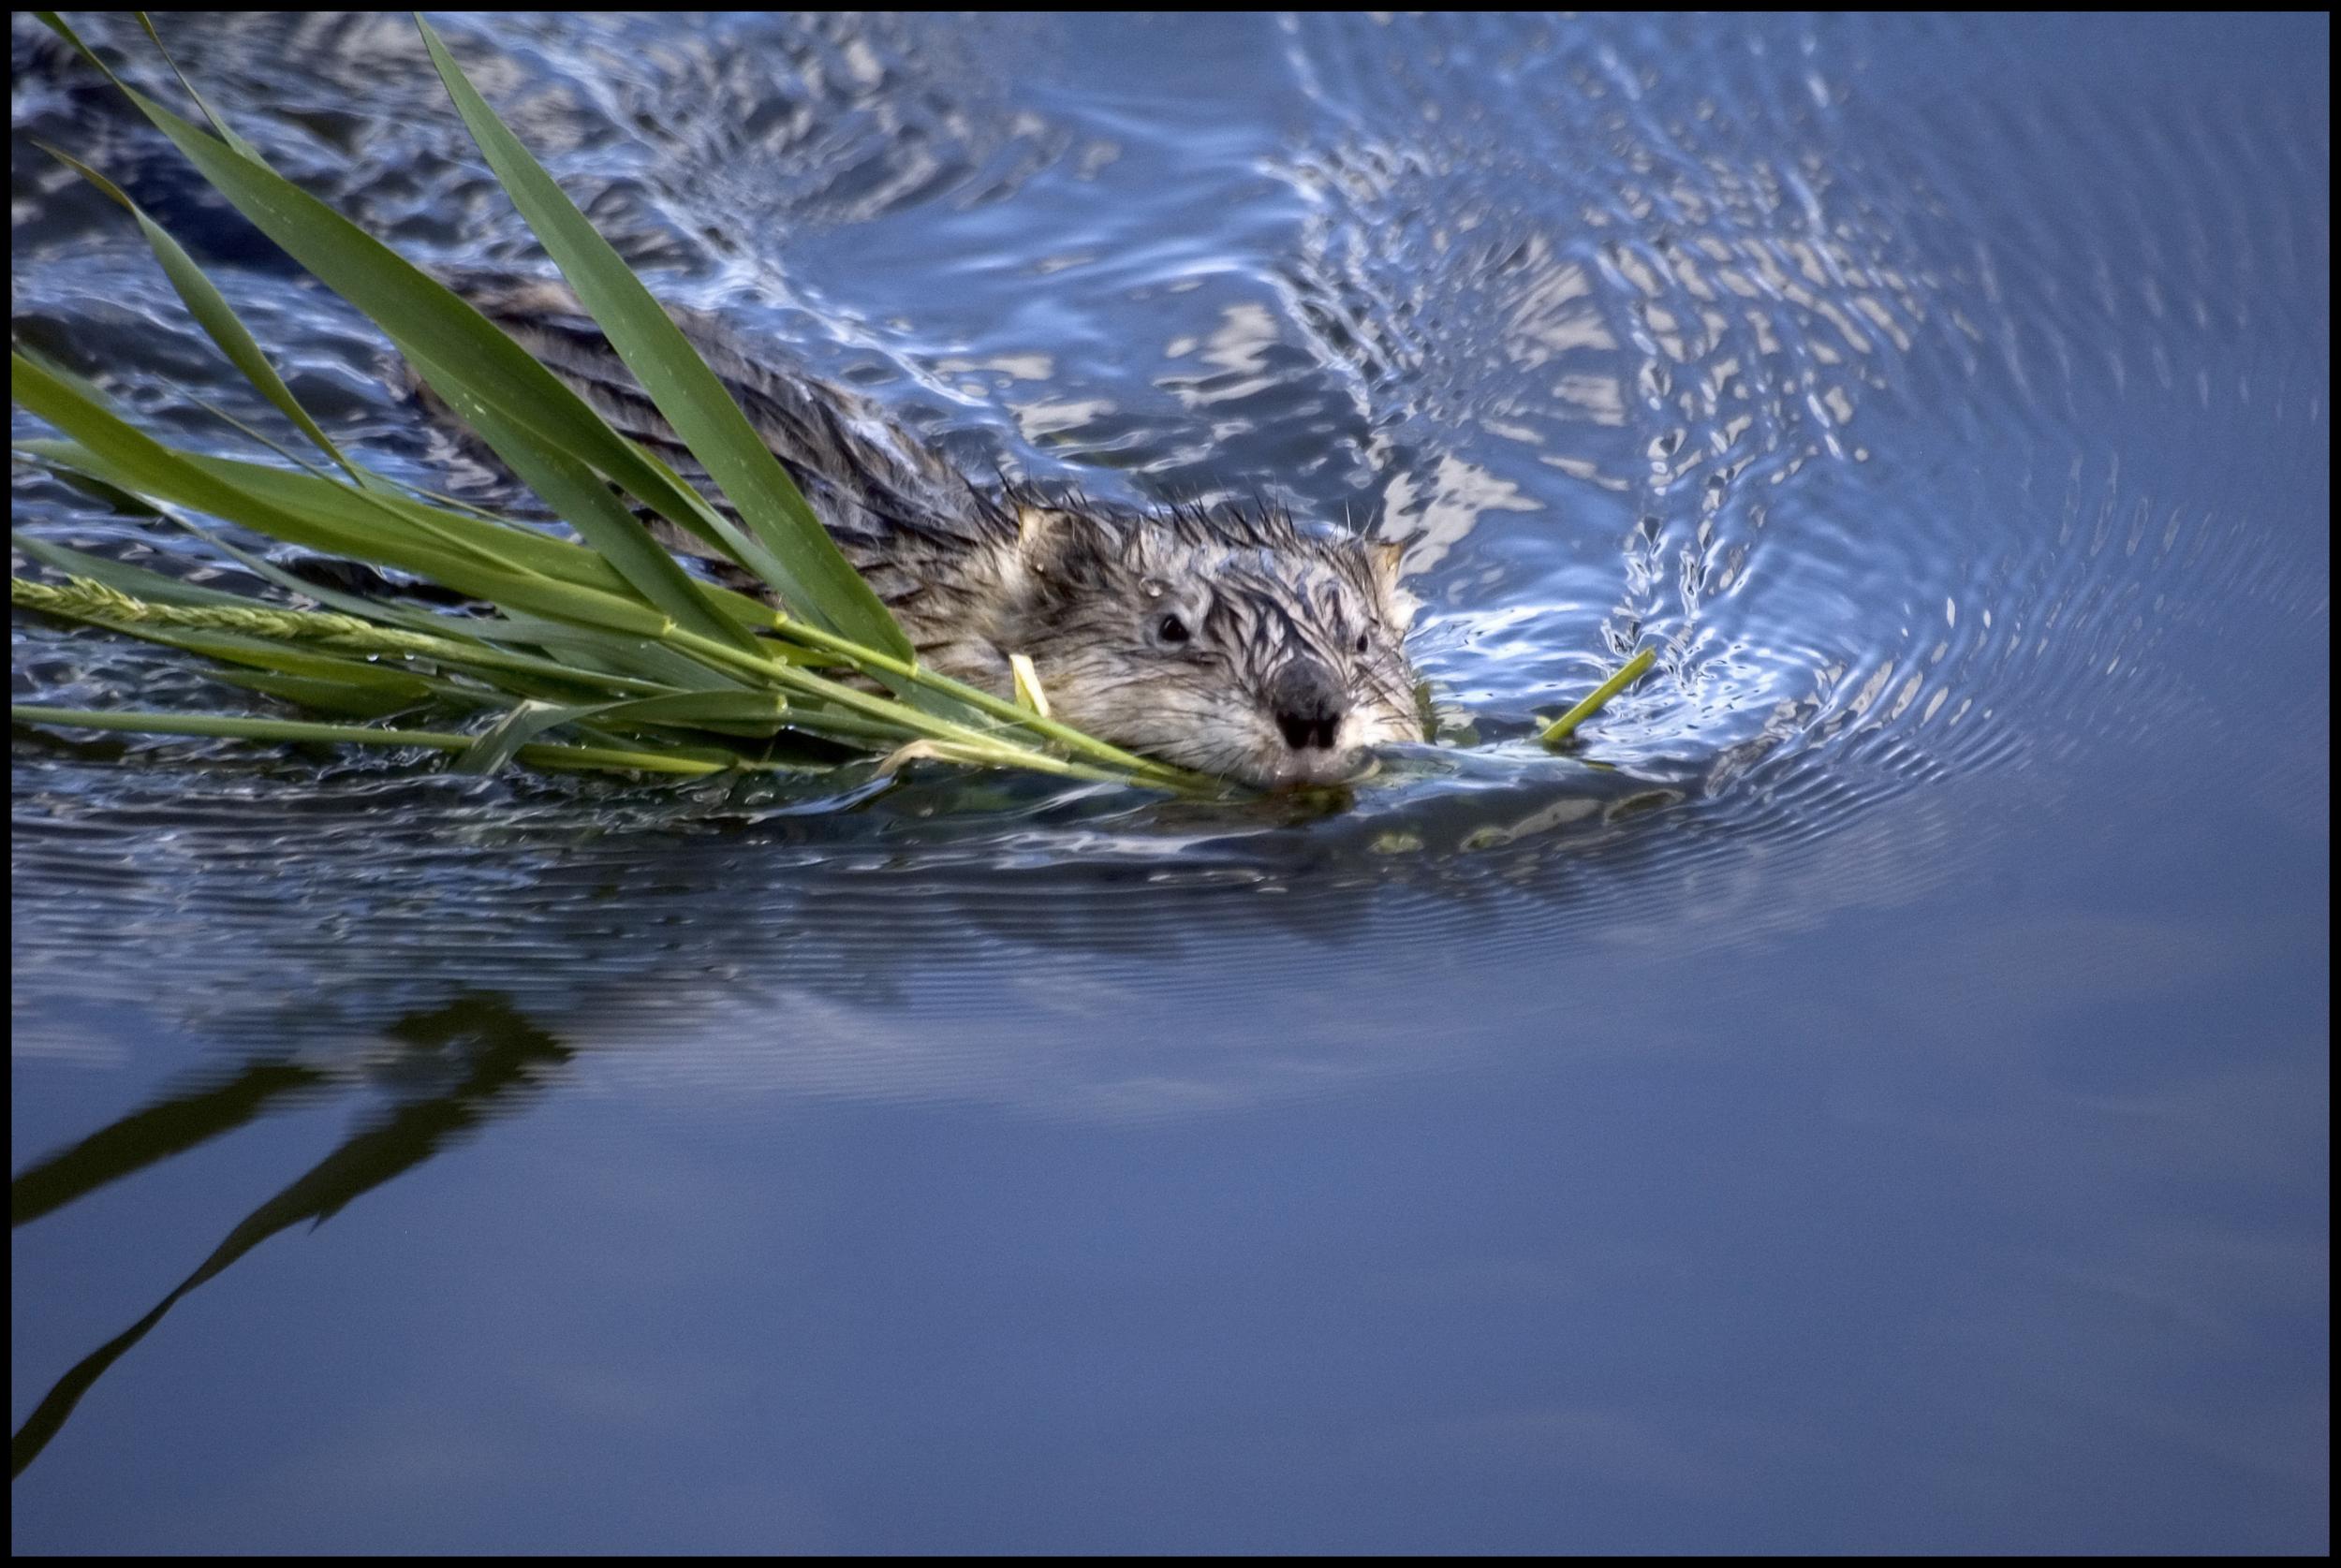 Beaver, Malheur National Wildlife Refuge, OR